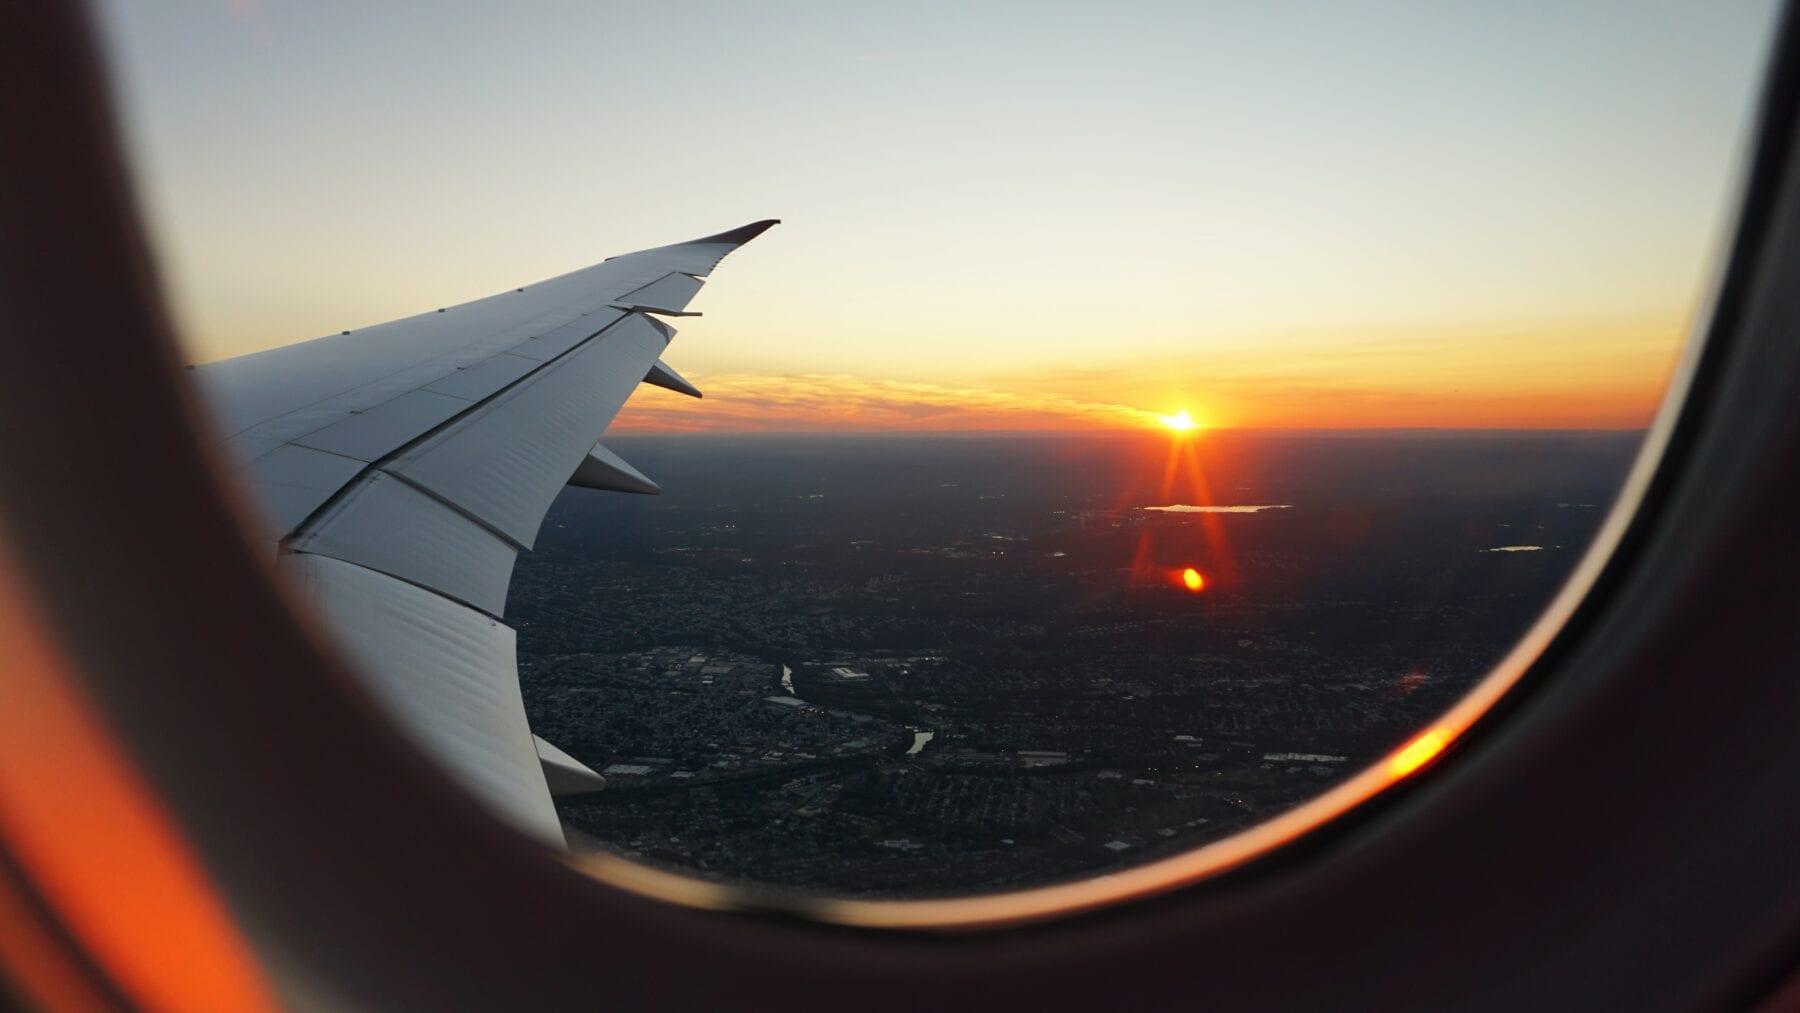 Voorbereid op reis vliegtuig